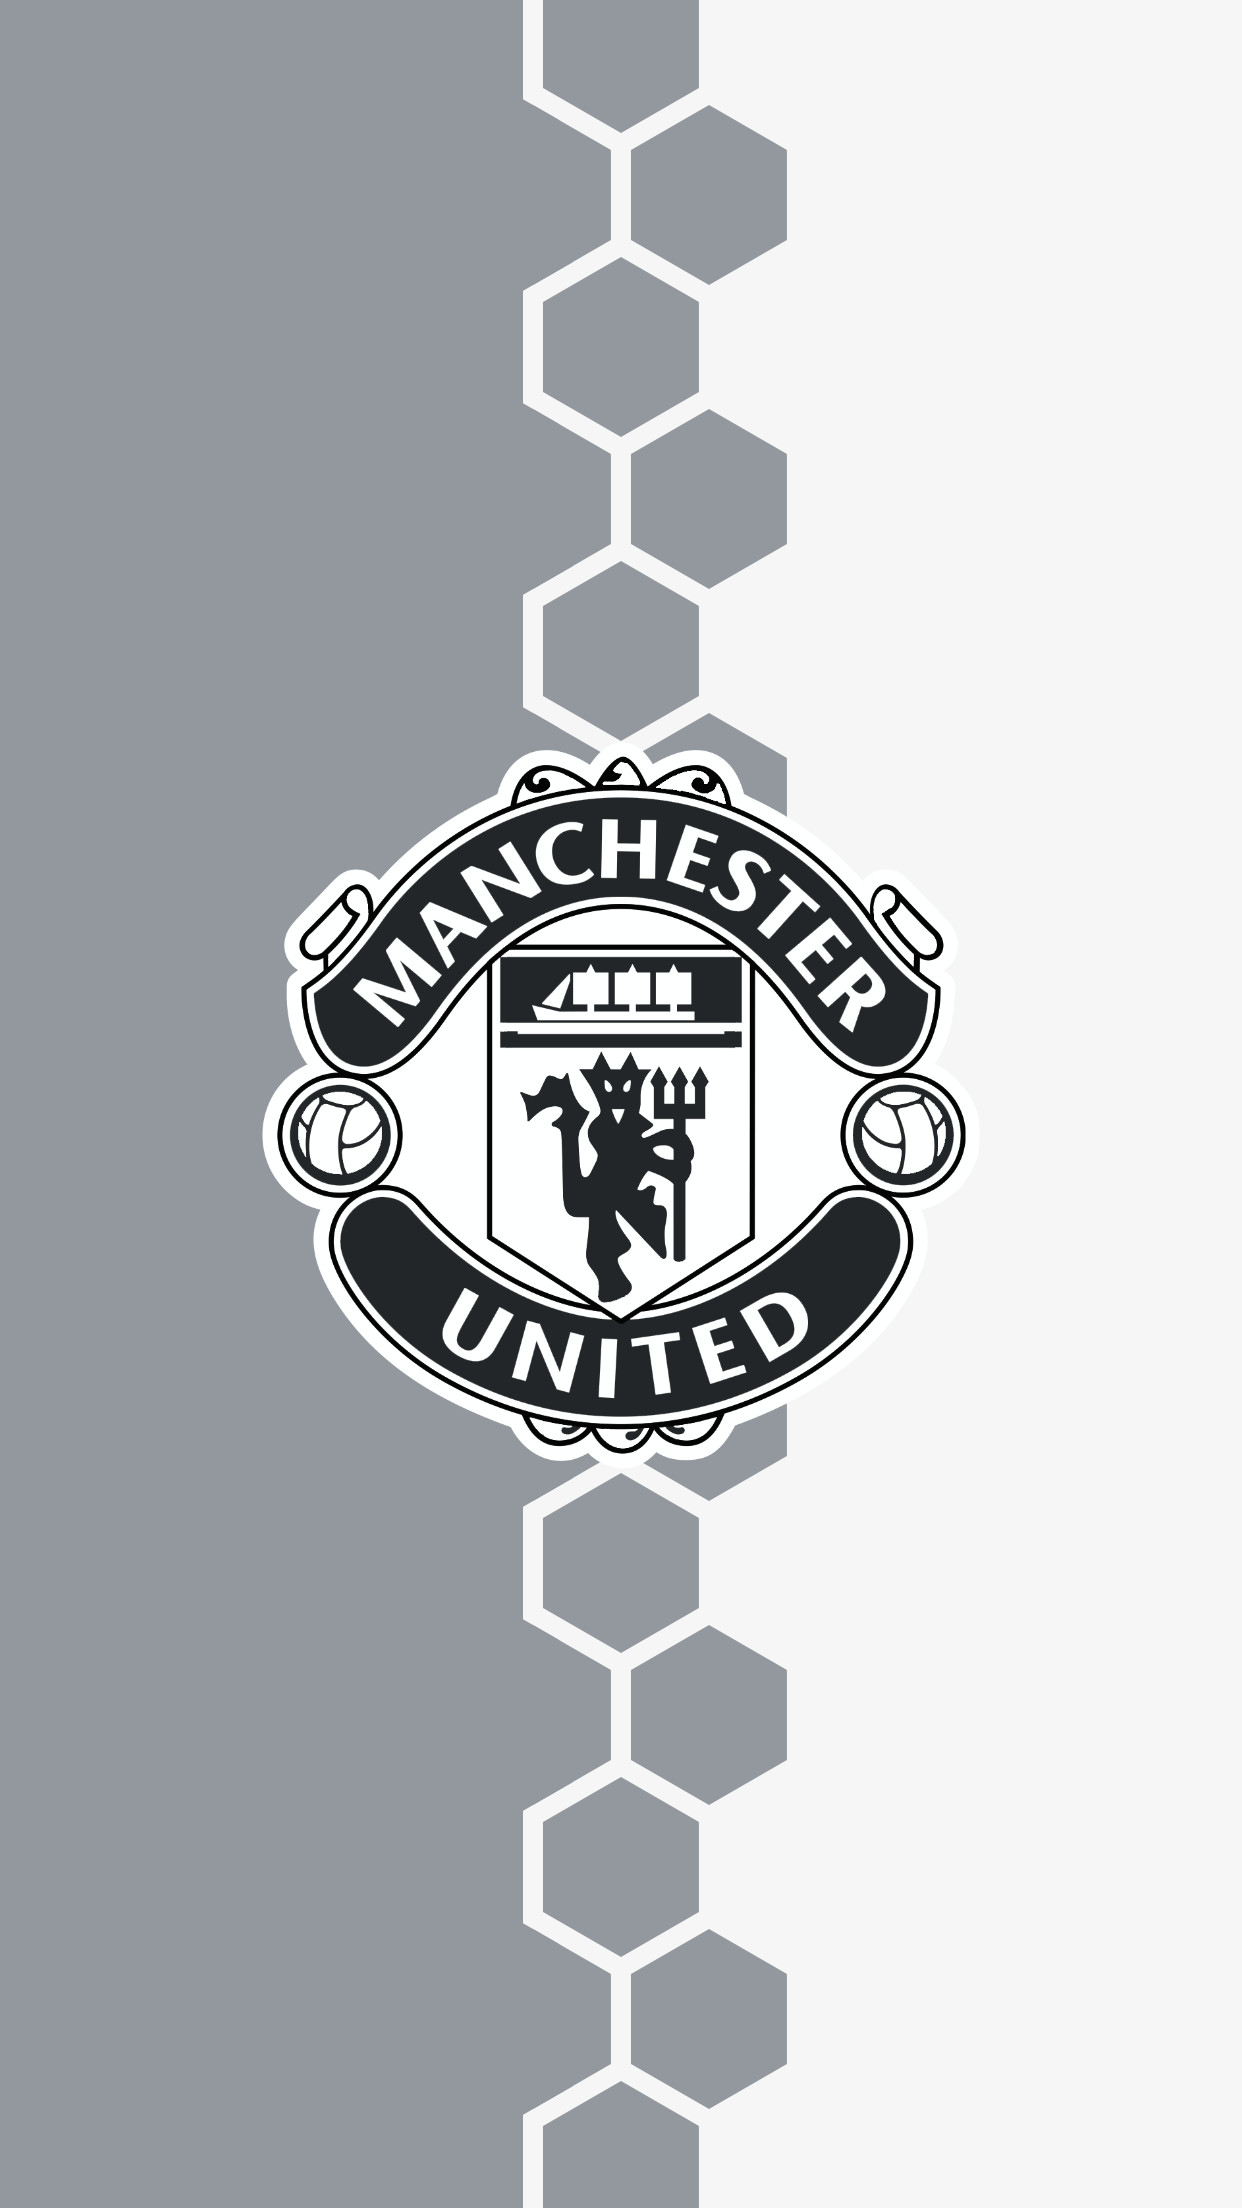 Man Utd Wallpapers 2018 68 Images